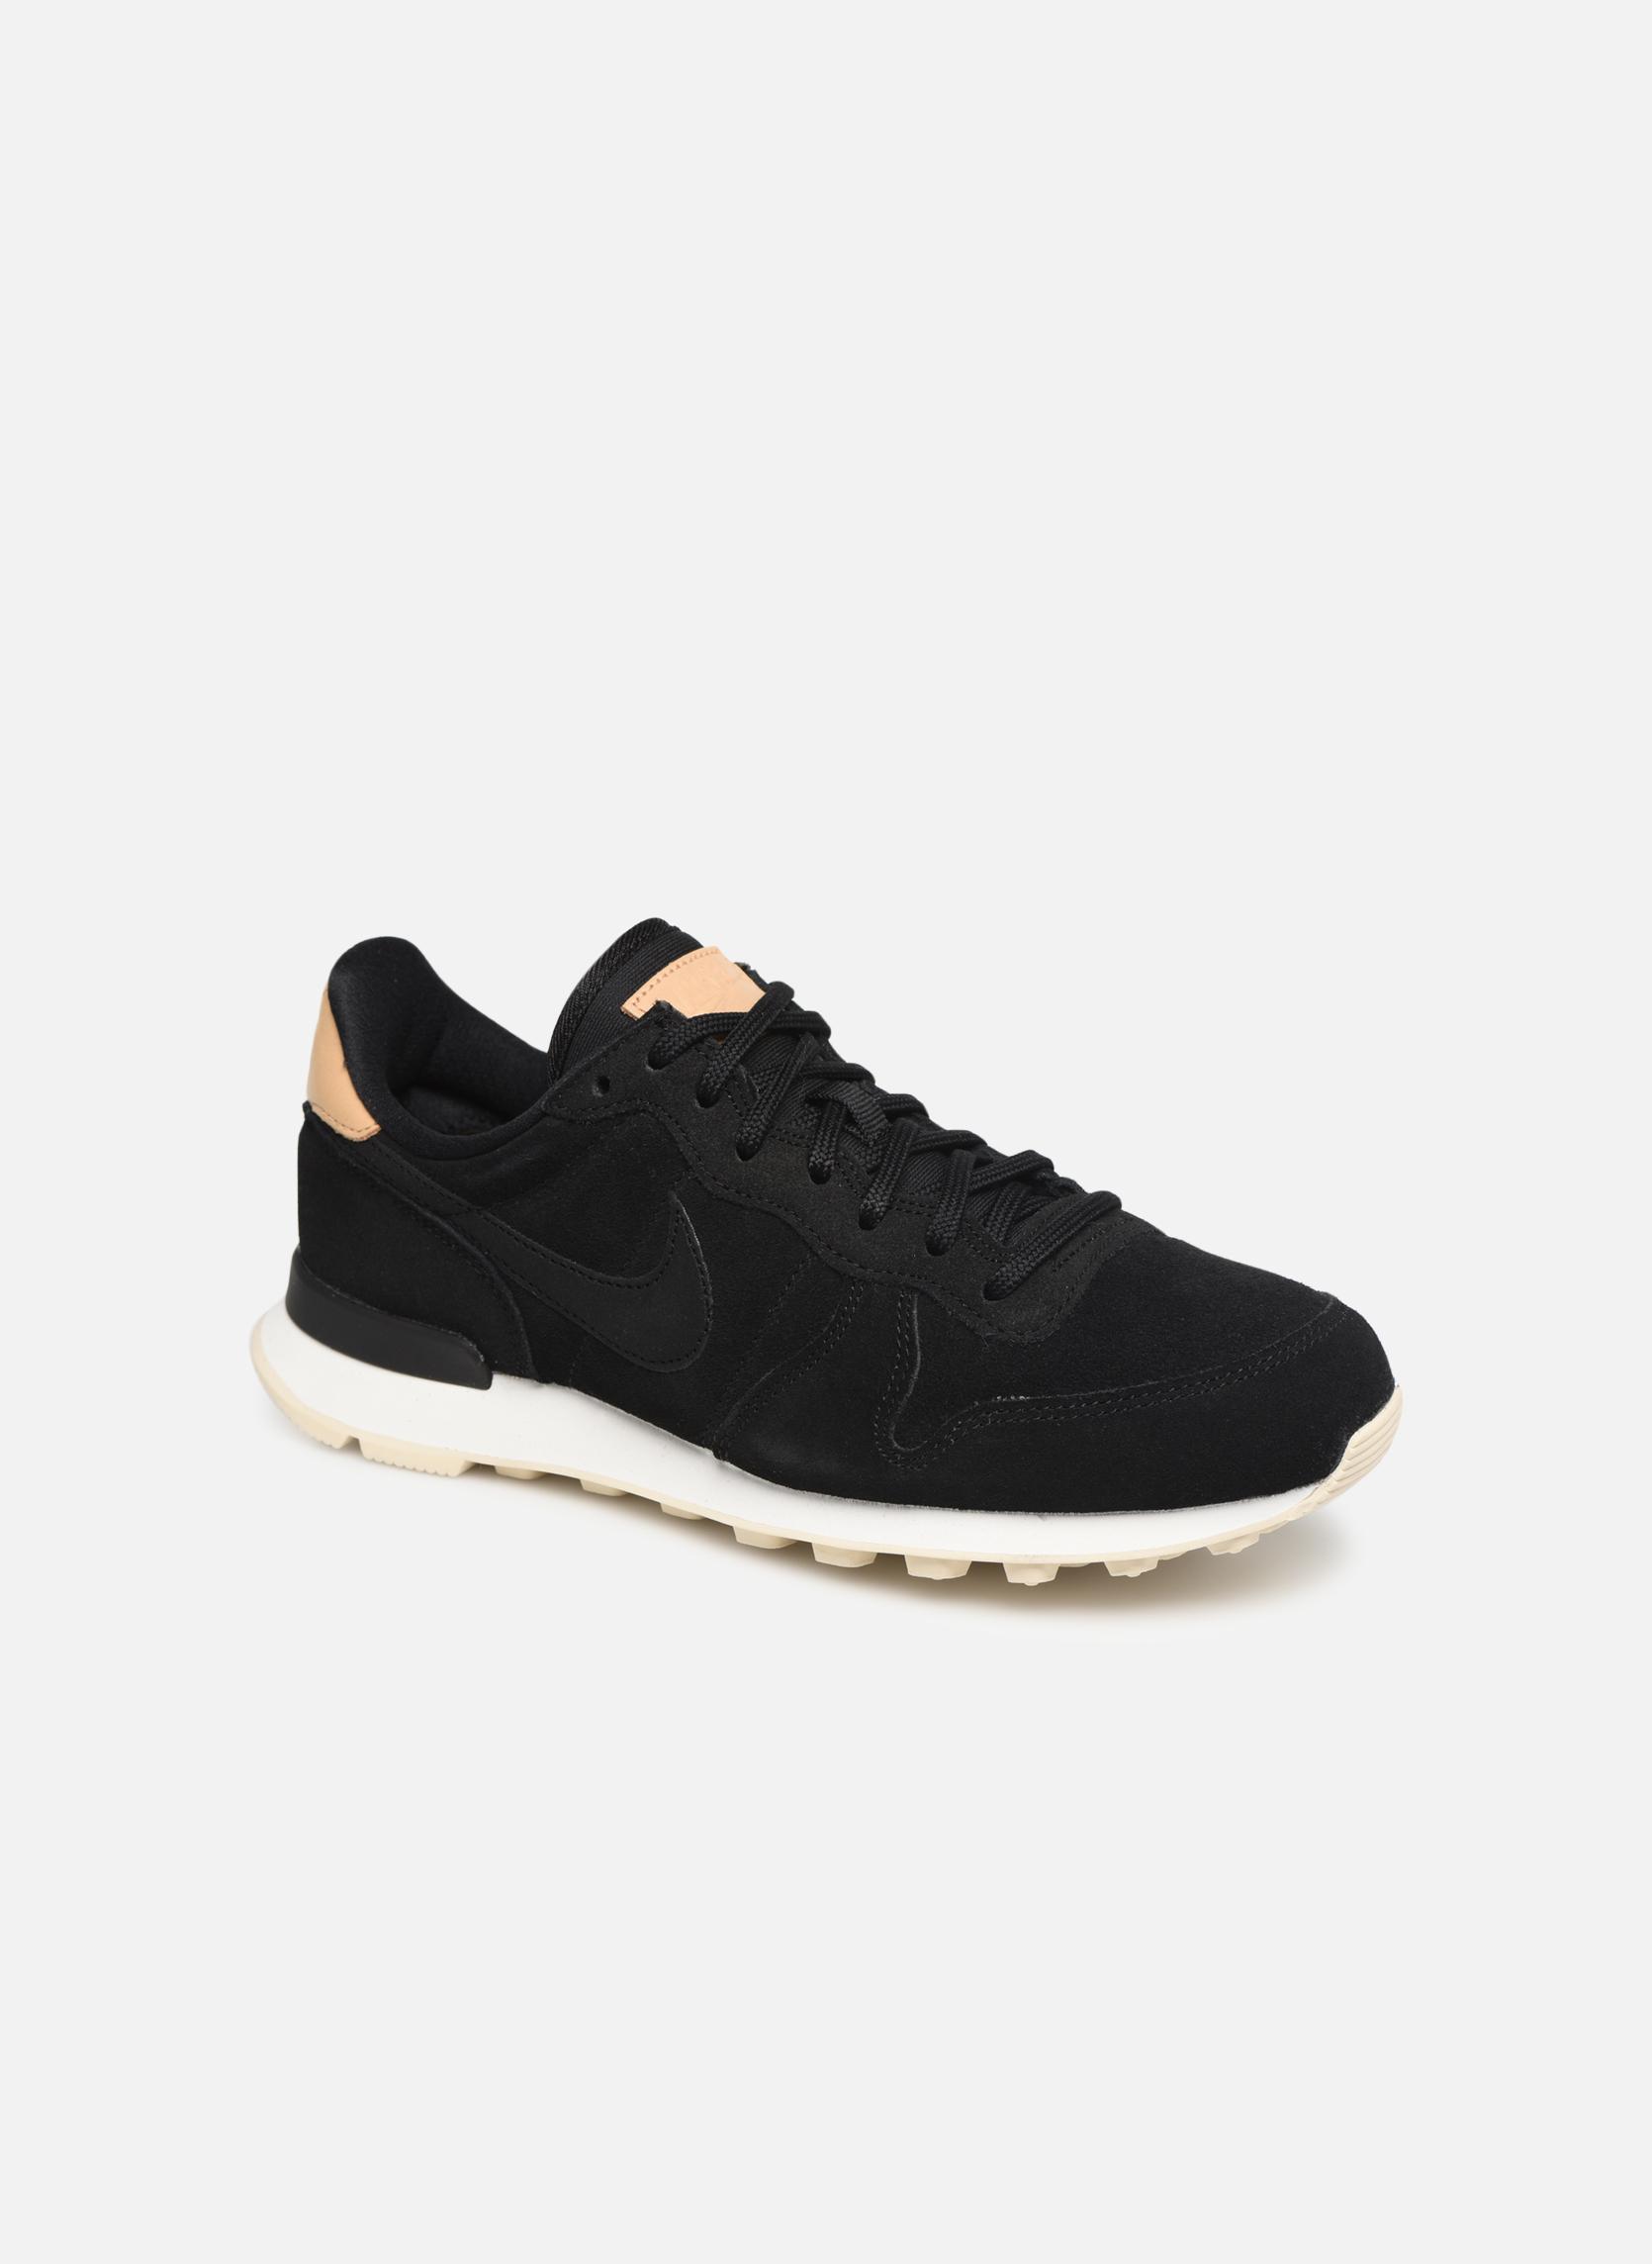 Angemessener Preis Nike Schuhe Damen Schwarz Nike Running